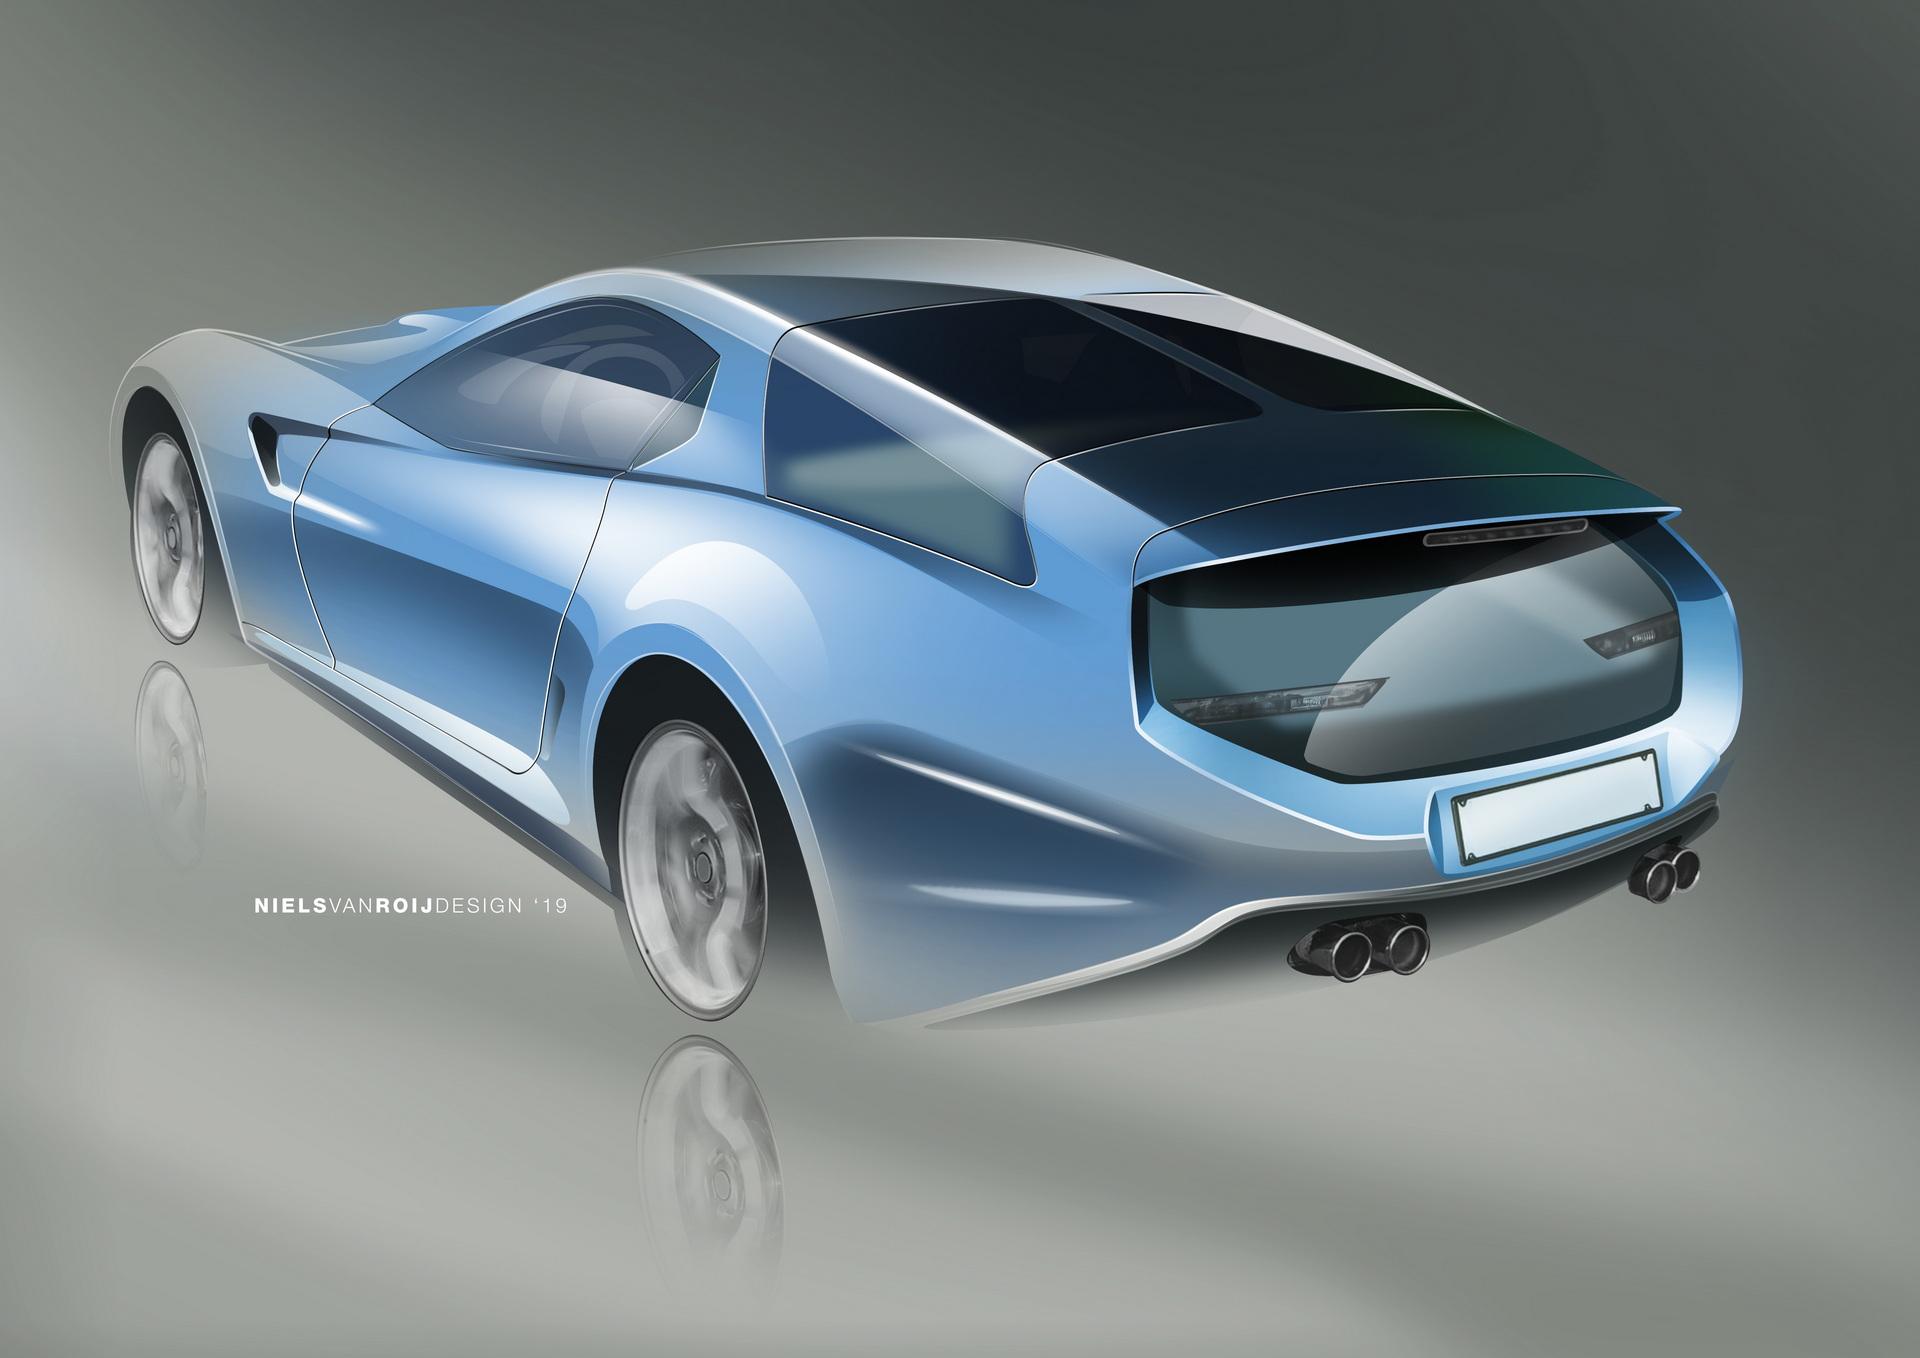 Ferrari-Daytona-Shooting-Brake-Hommage-by-Niels-van-Roij-Design-13